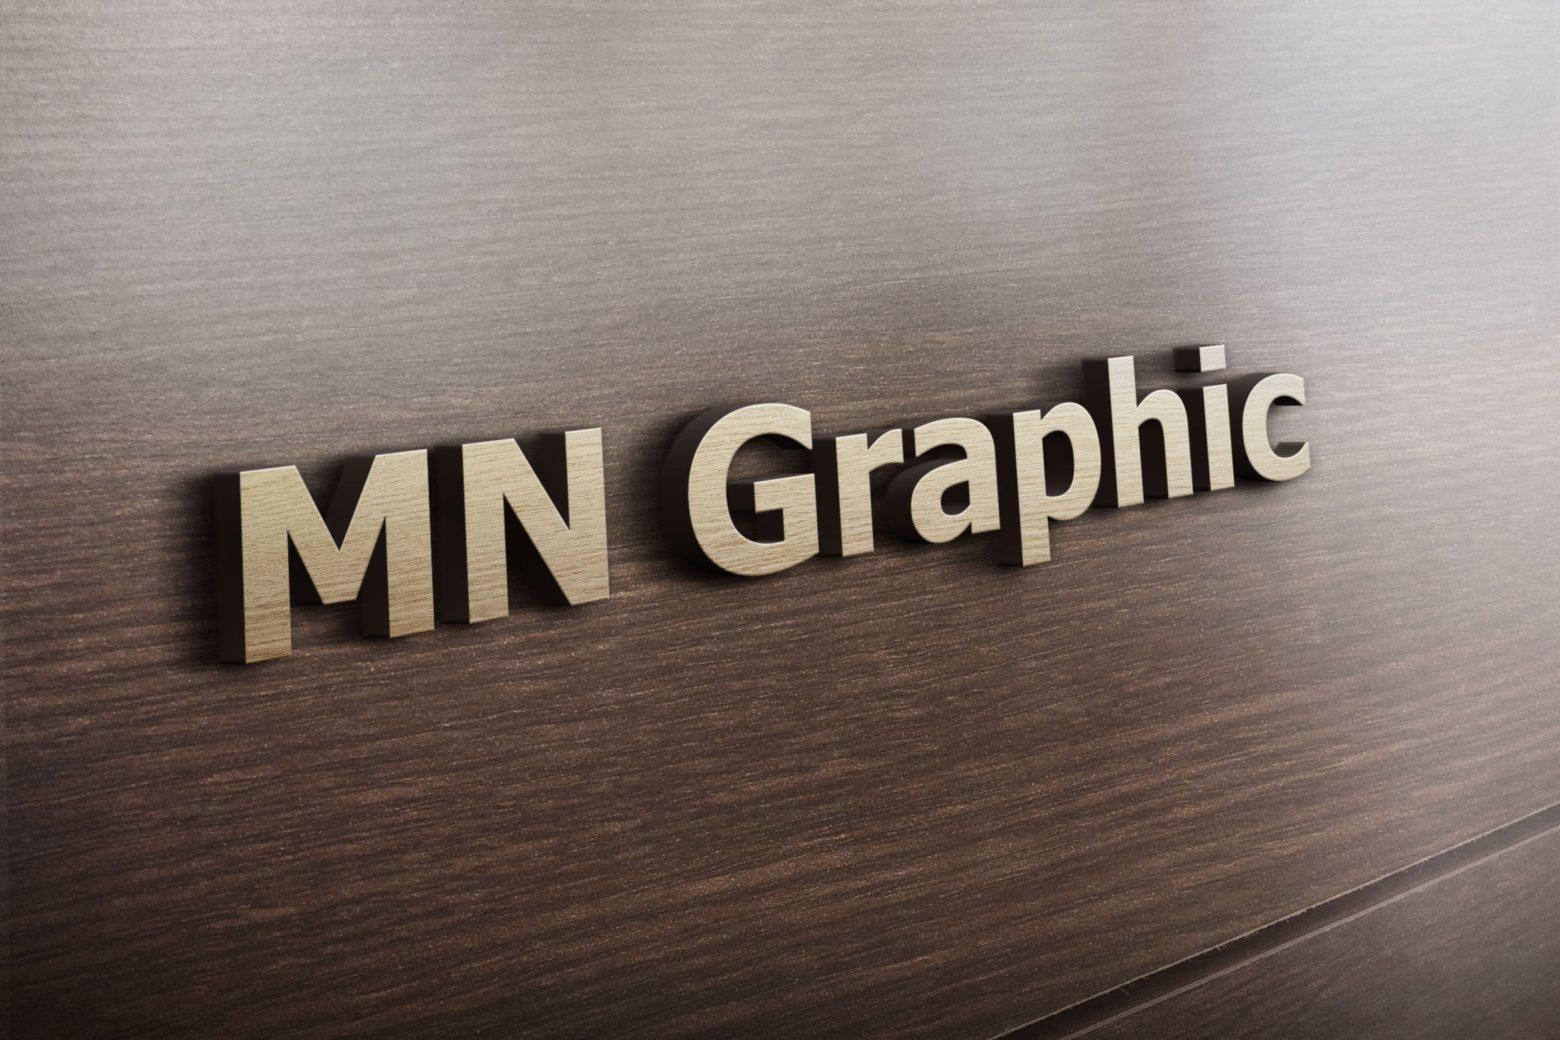 3D Wooden Logo MockUp 1560x1040 - موکاپ سه بعدی متن با طرح چوبی